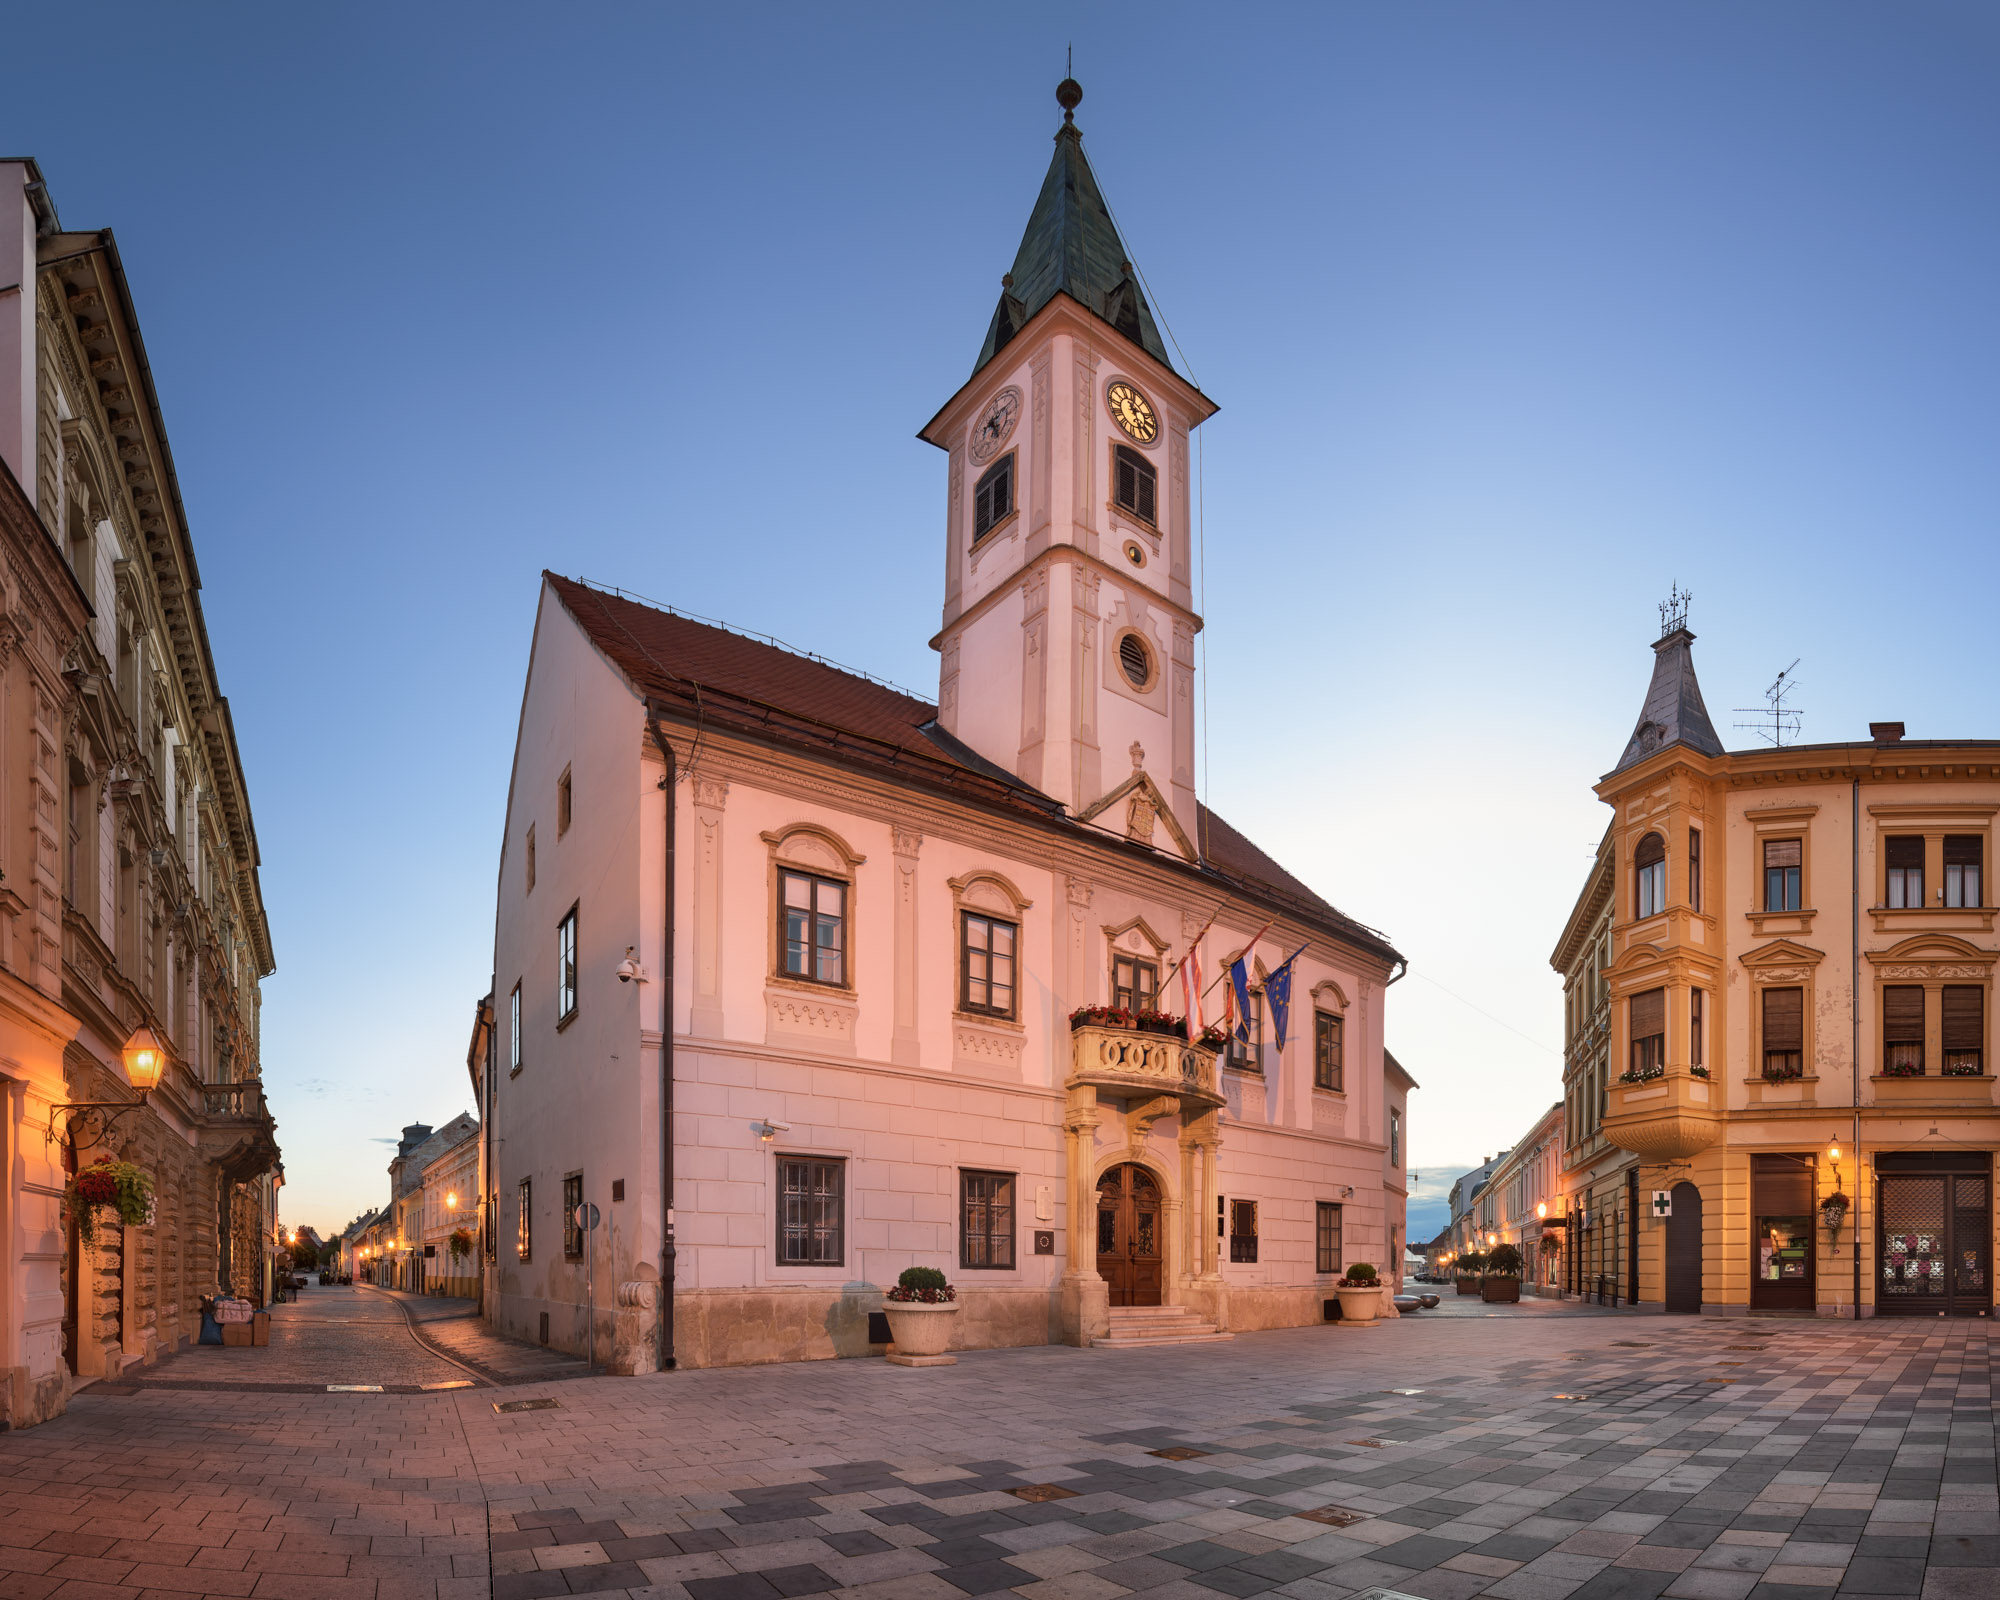 Varazdin Townhall and Trg Kralja Tomislava, Varazdin, Croatia